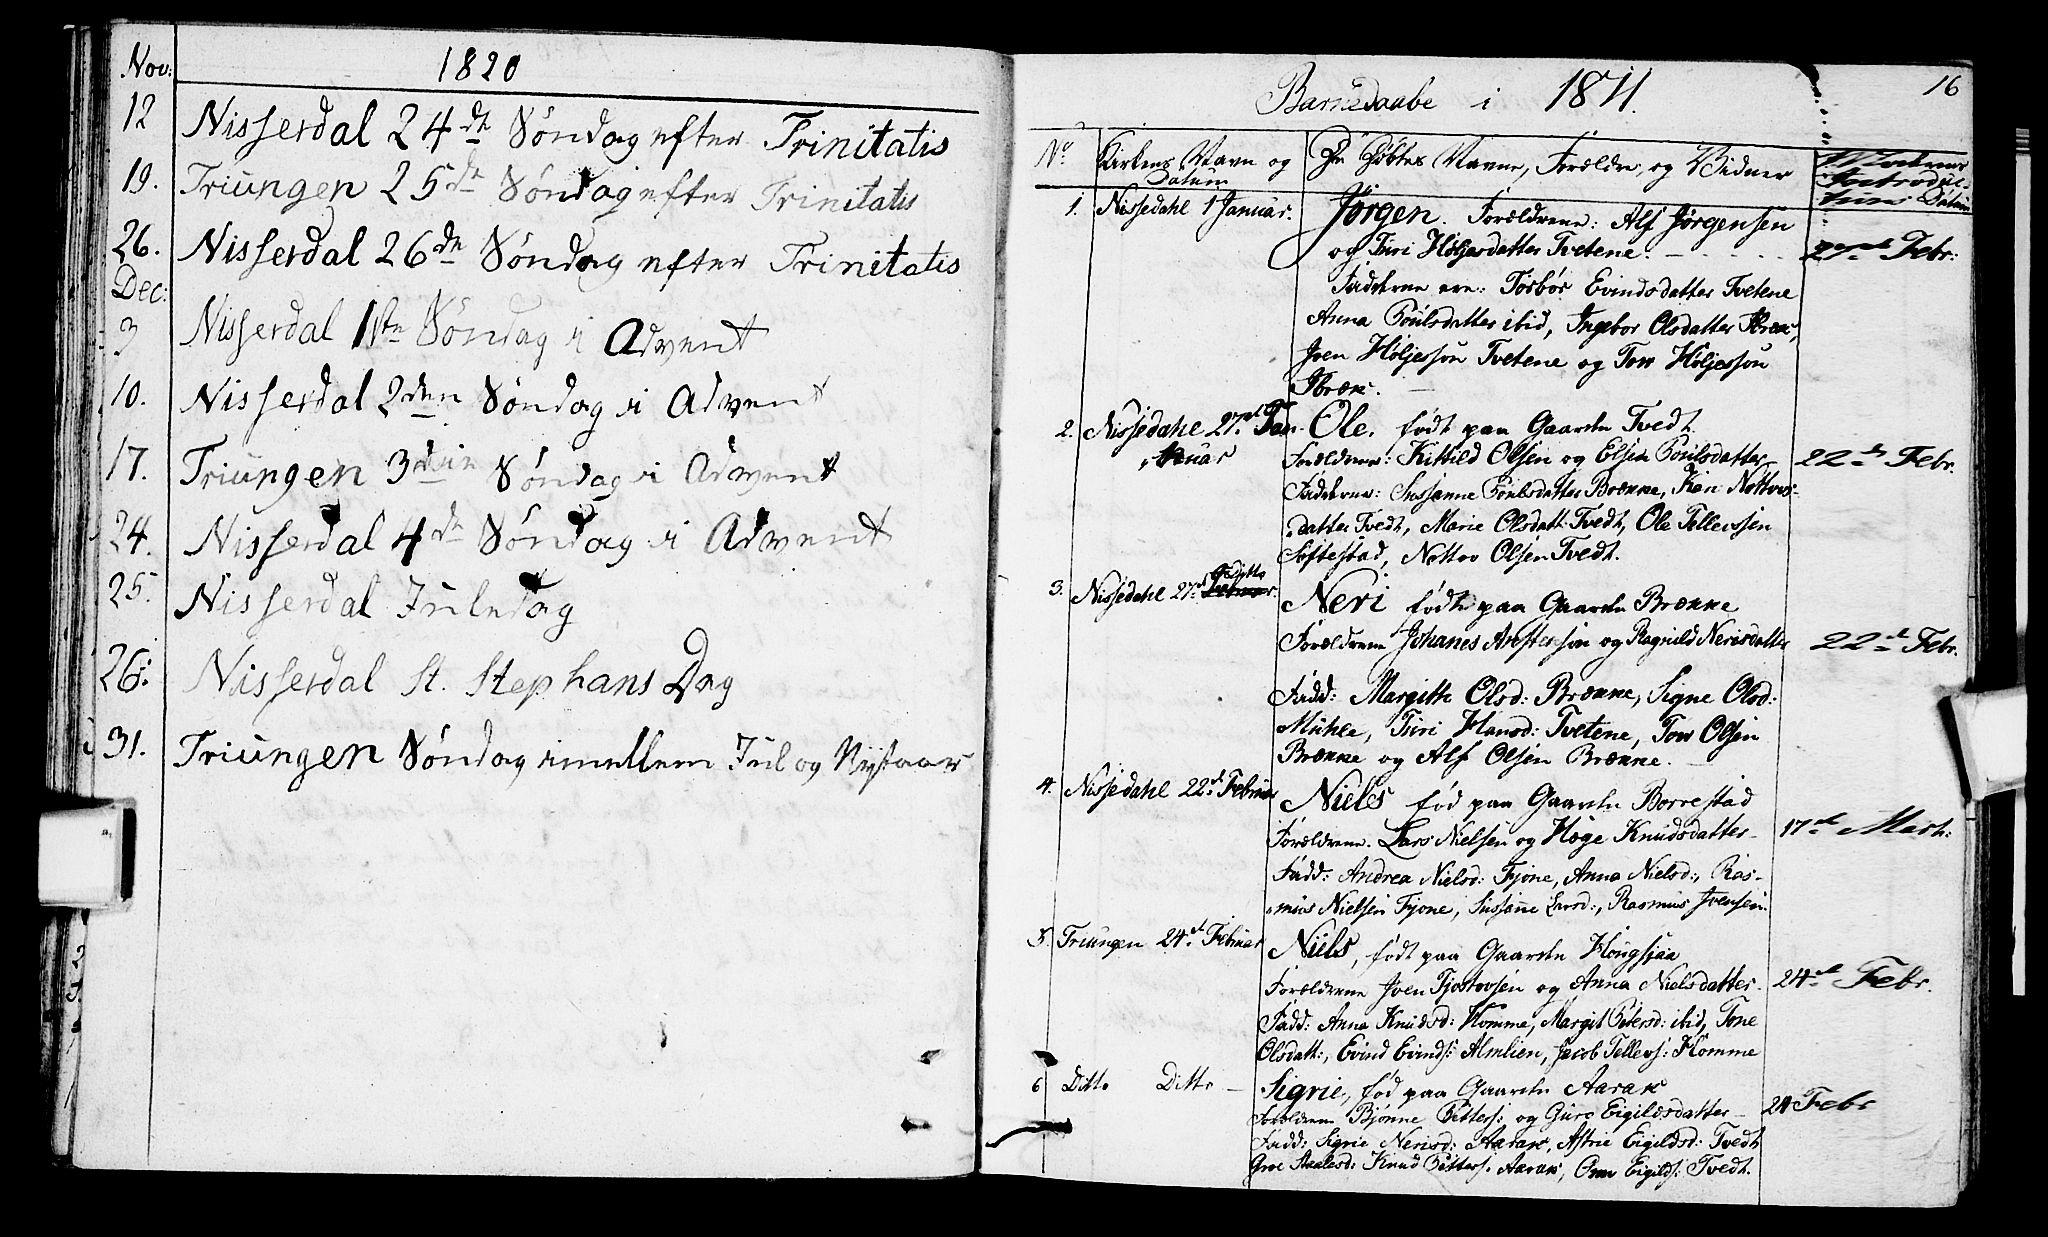 SAKO, Nissedal kirkebøker, F/Fa/L0001: Ministerialbok nr. I 1, 1811-1814, s. 16